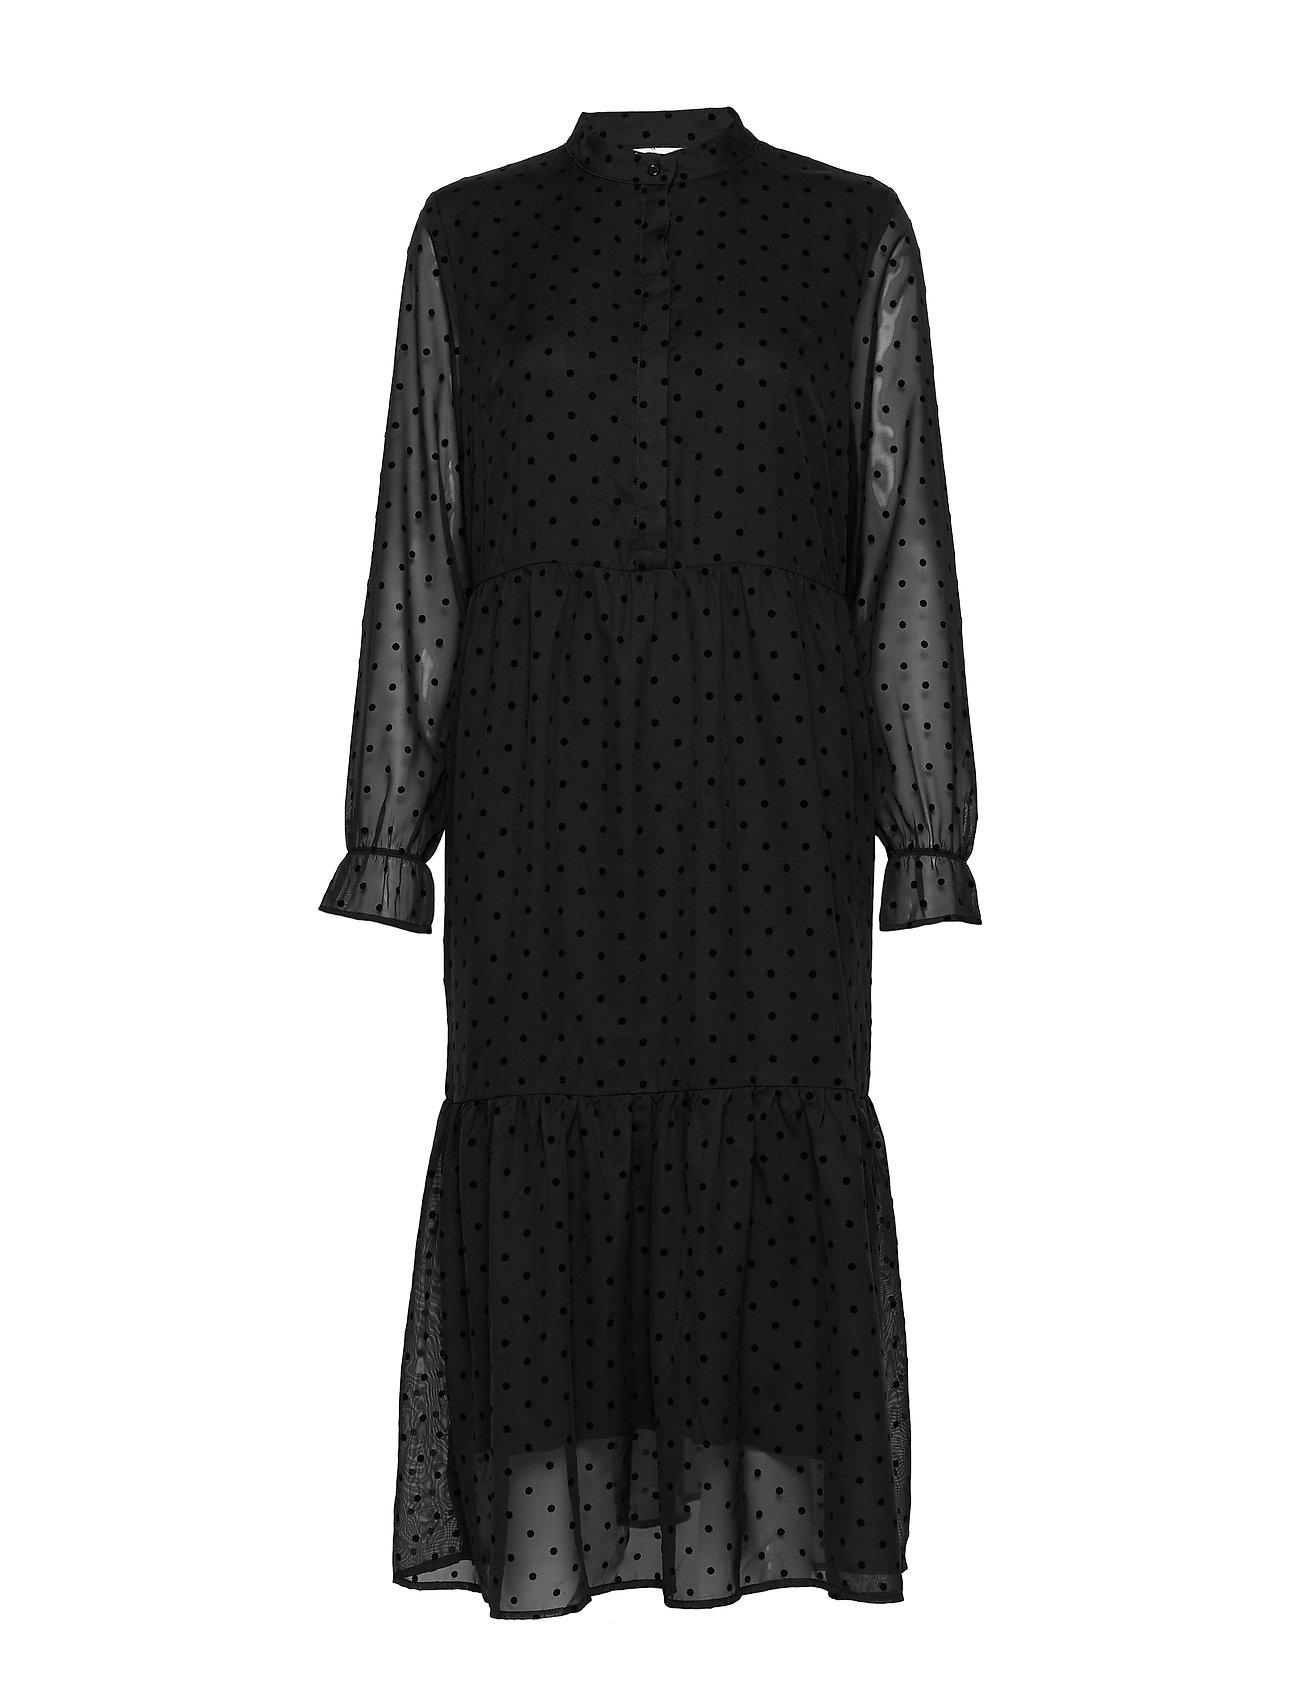 Coster Copenhagen Dress w. gatherings at skirt part - BLACK